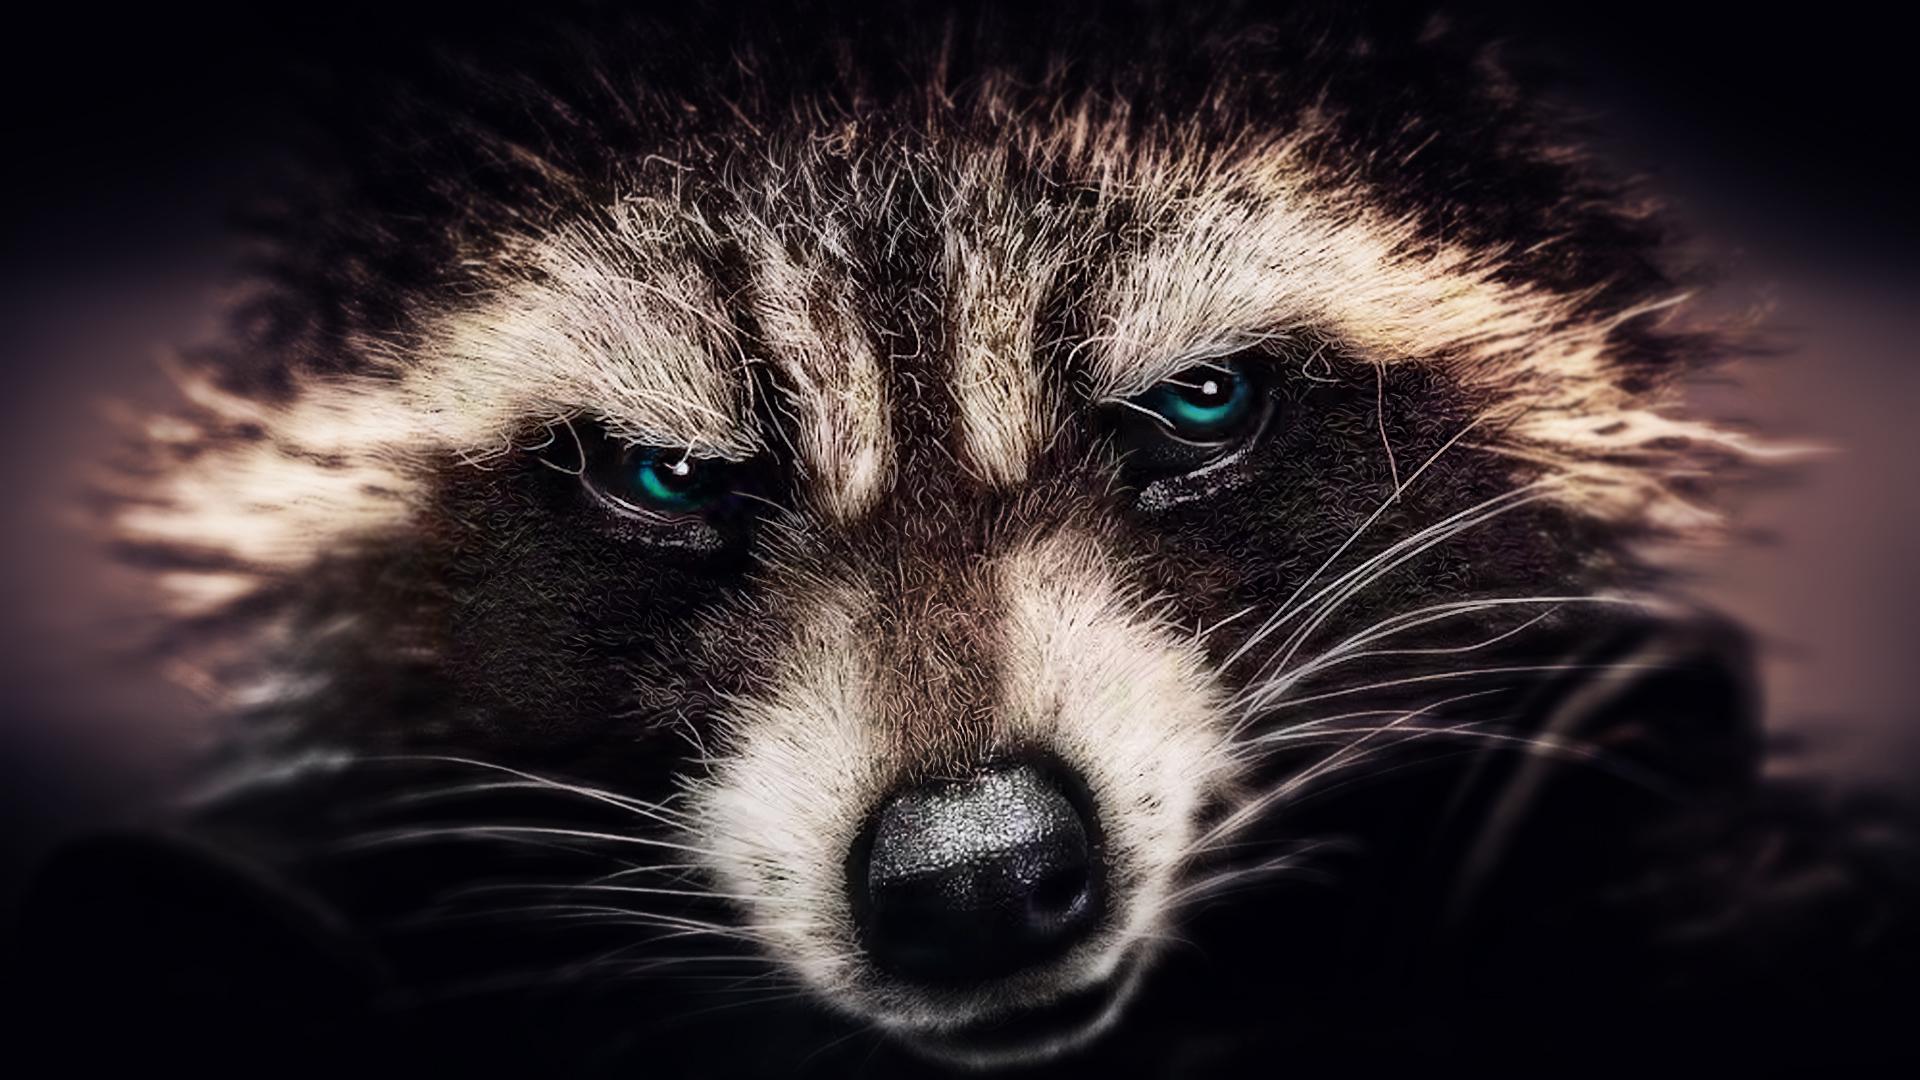 Rocket Raccoon wallpaper (6) by BiigM on DeviantArt Raccoon Face Clip Art